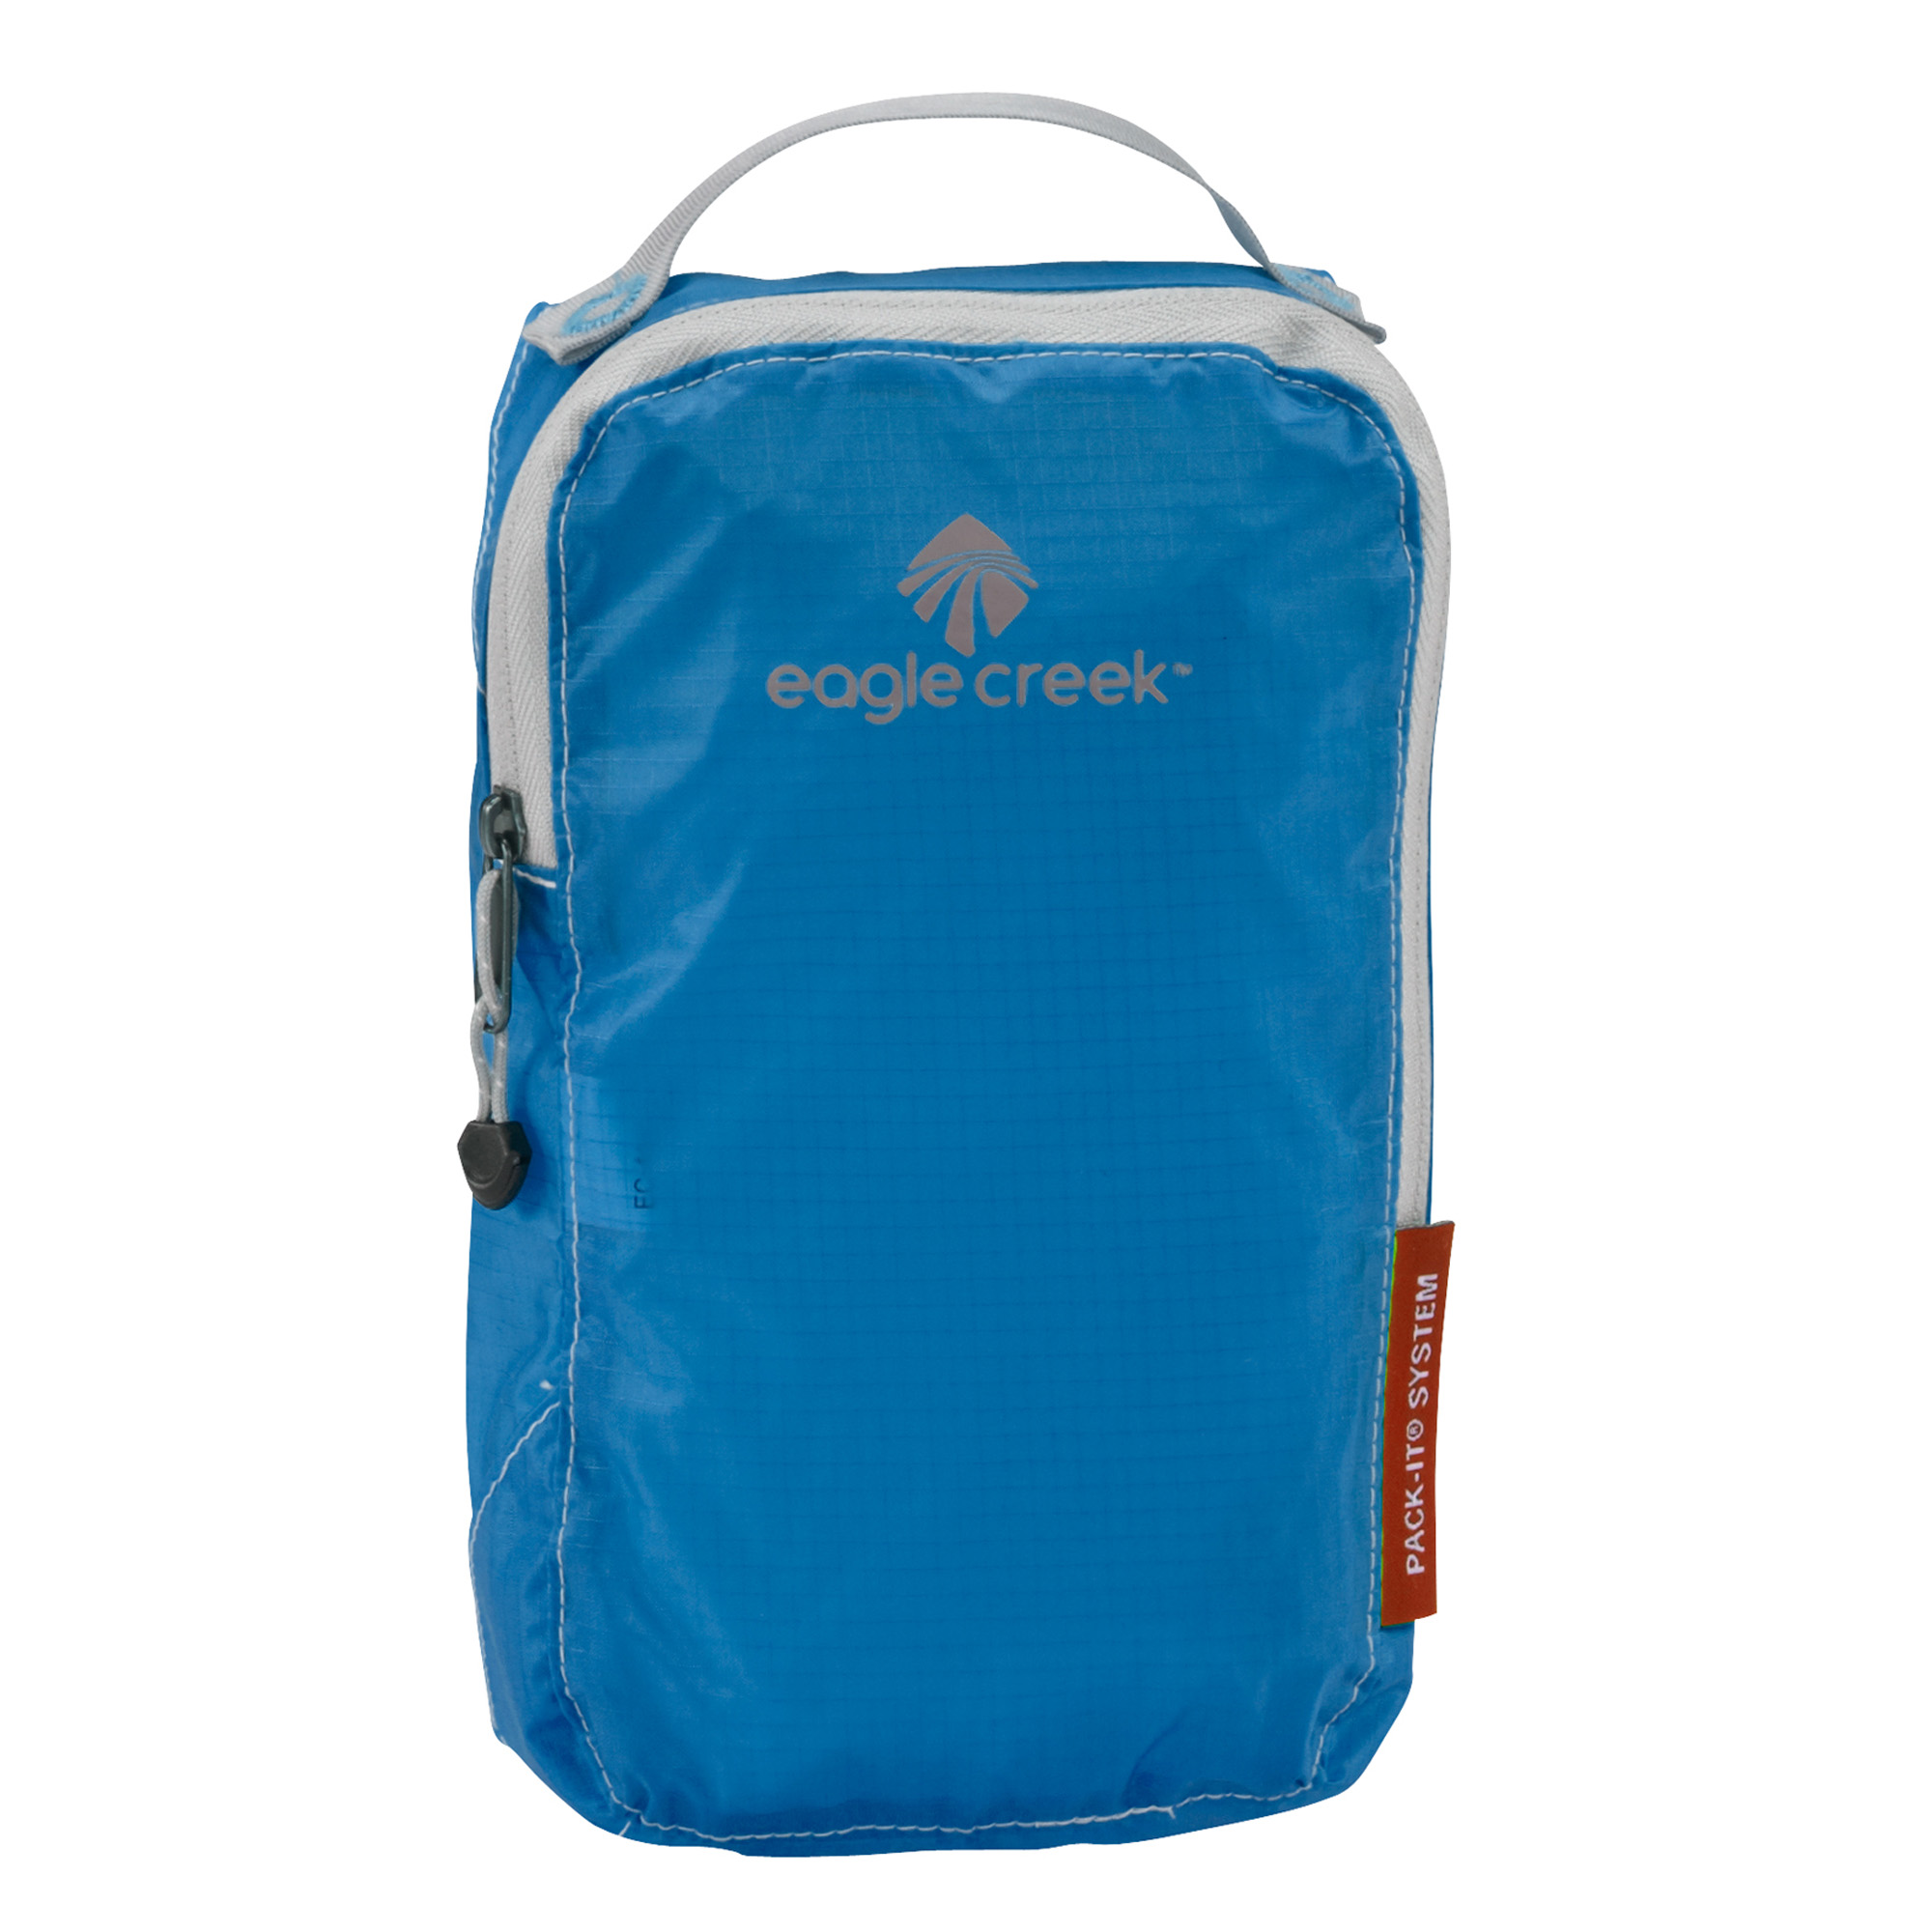 Pack-It Specter Quarter Cube - Brilliant Blue